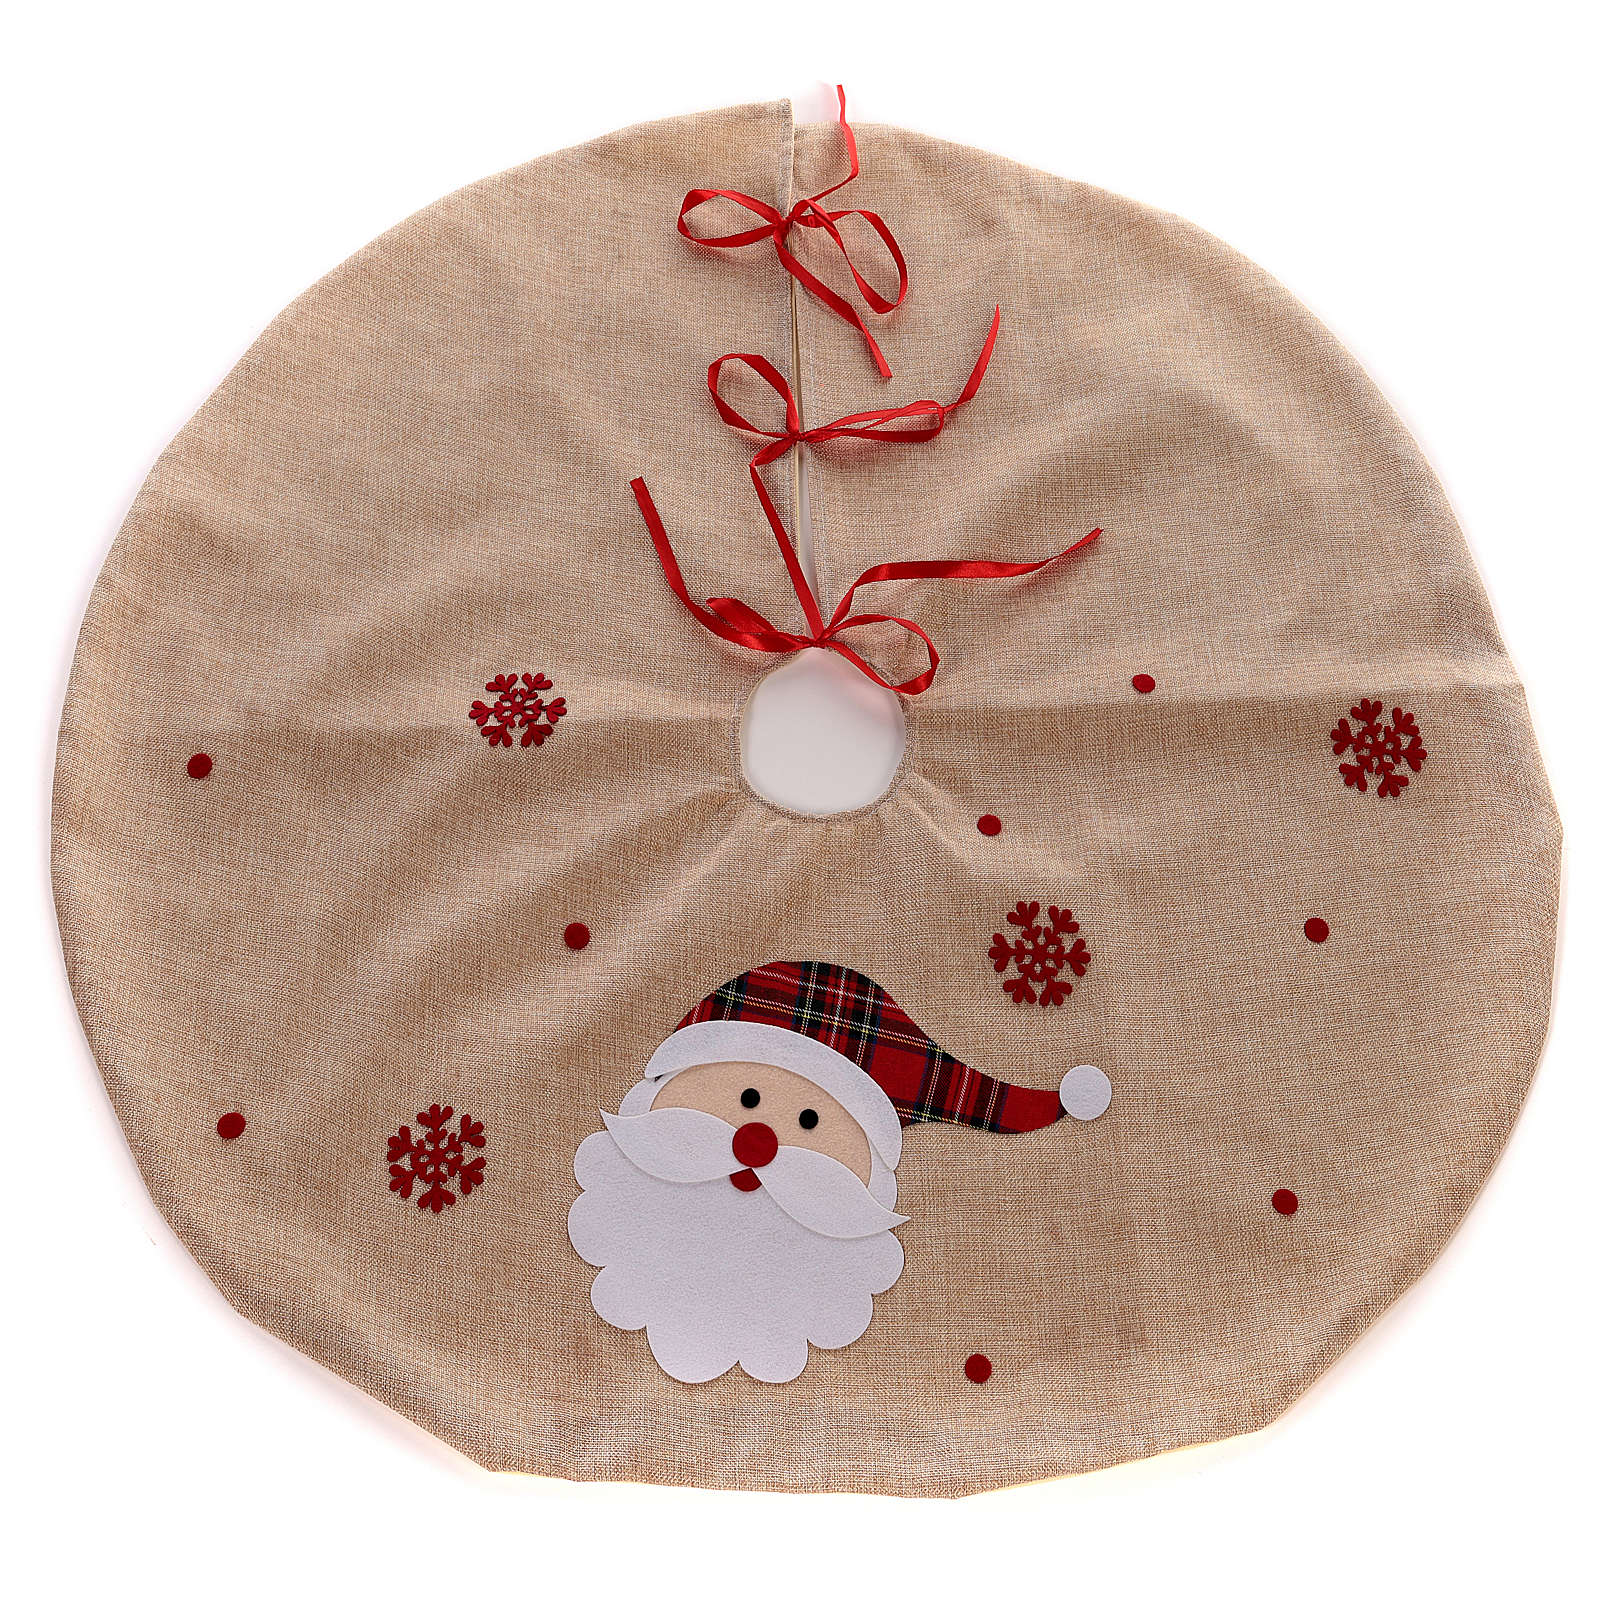 Juta Christmas tree skirt with Santa Chlaus 39 in 3